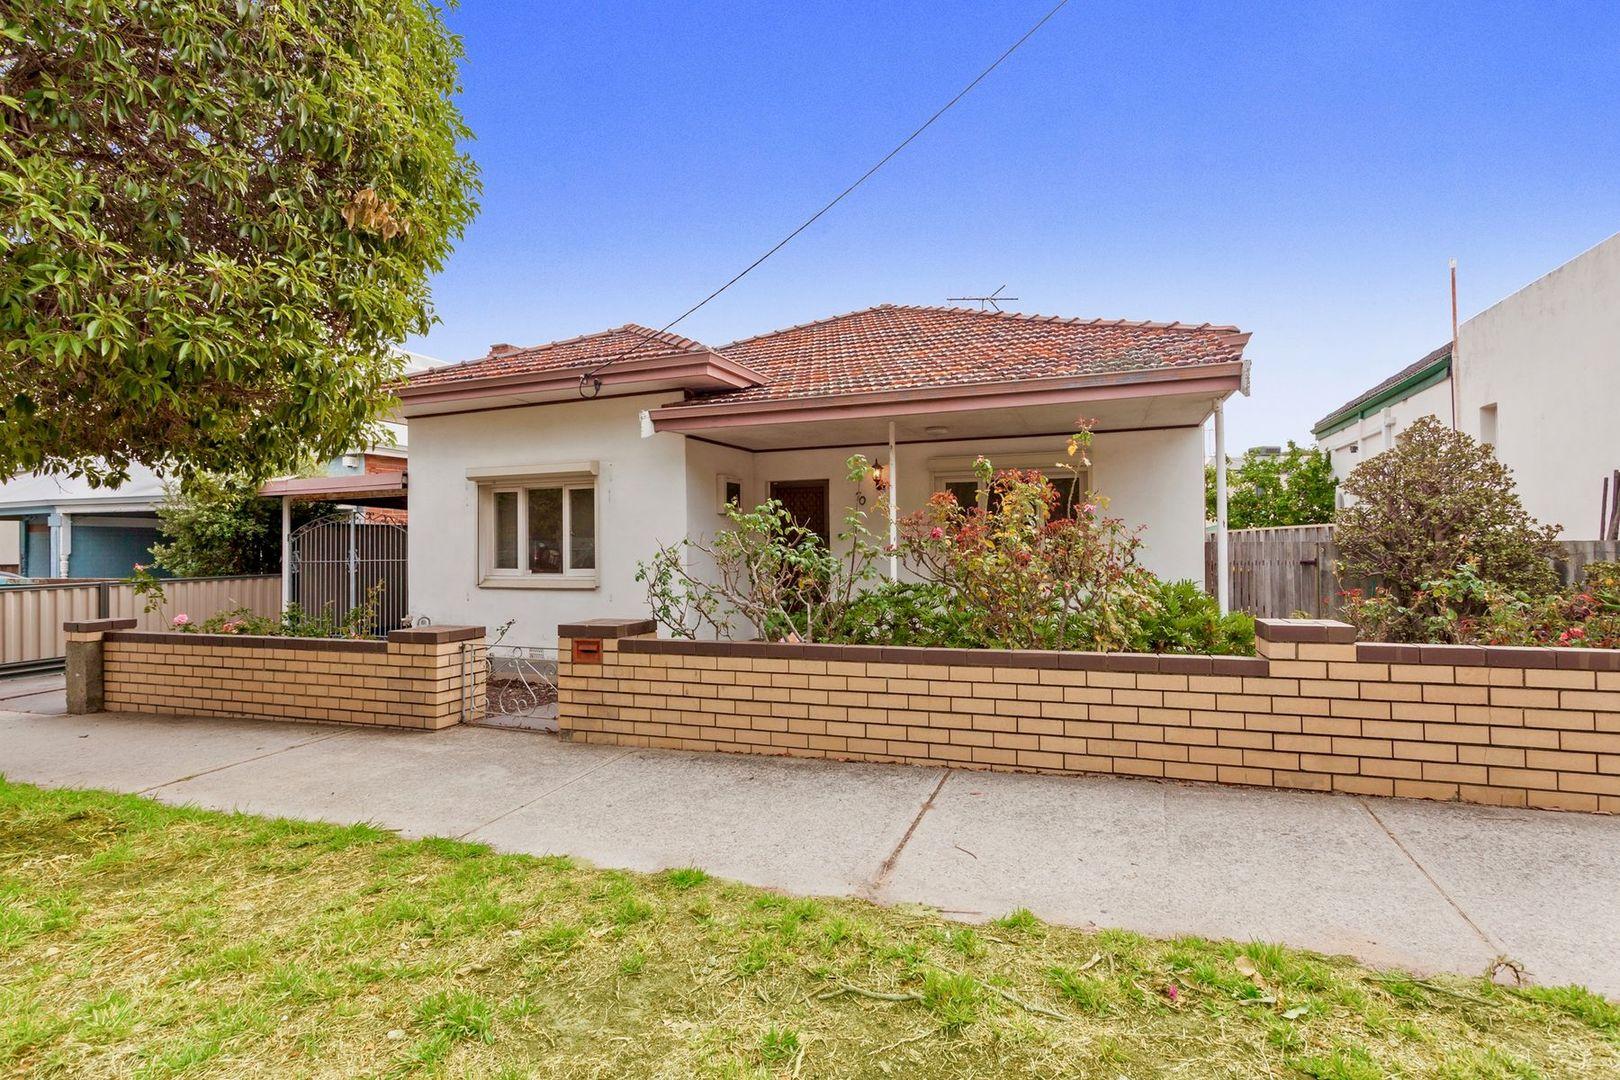 70 Carr Street, West Perth WA 6005, Image 0